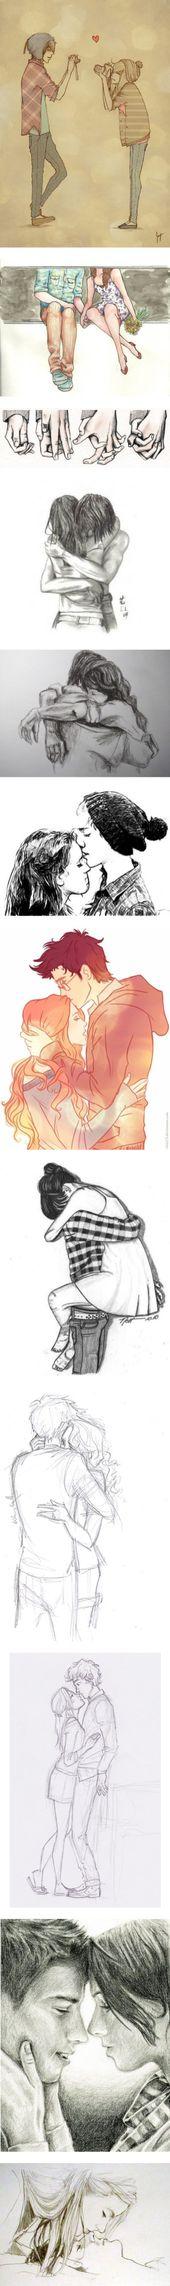 50 Cute Couple Drawings Ideas Couple Drawings Cute Couple Drawings Drawings